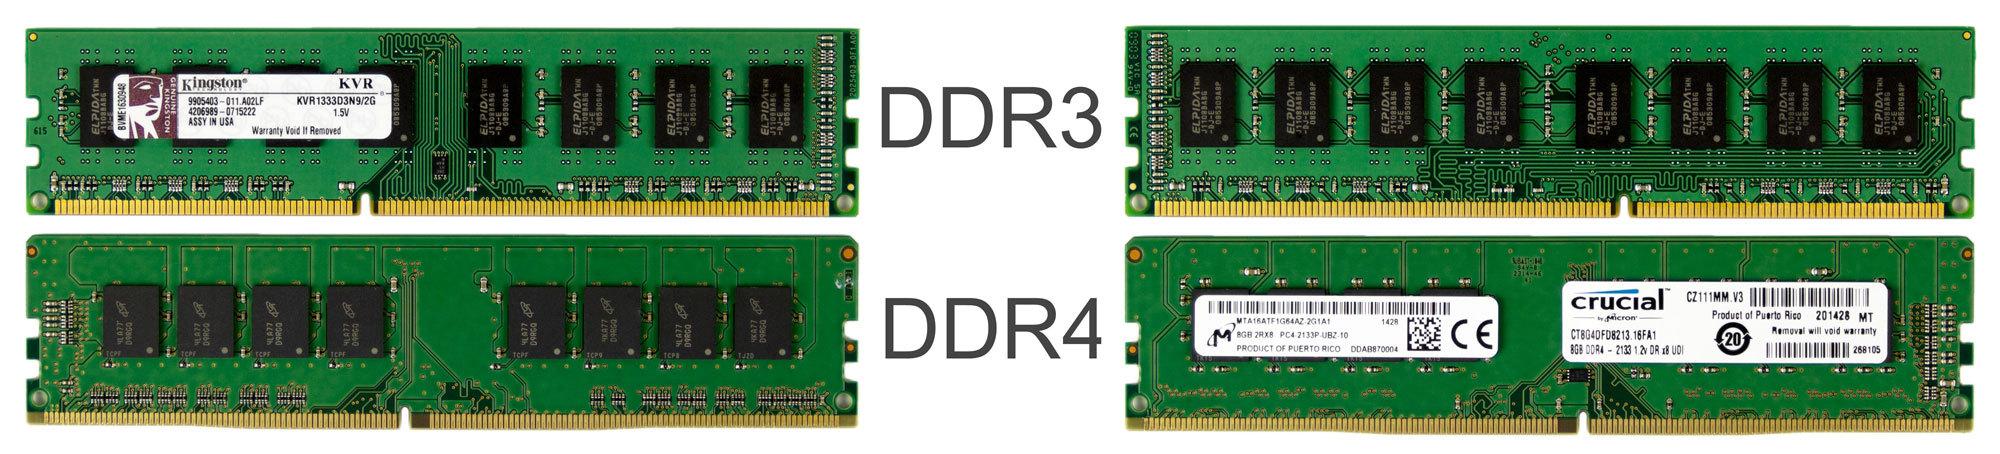 Tech Primer: DDR4 RAM